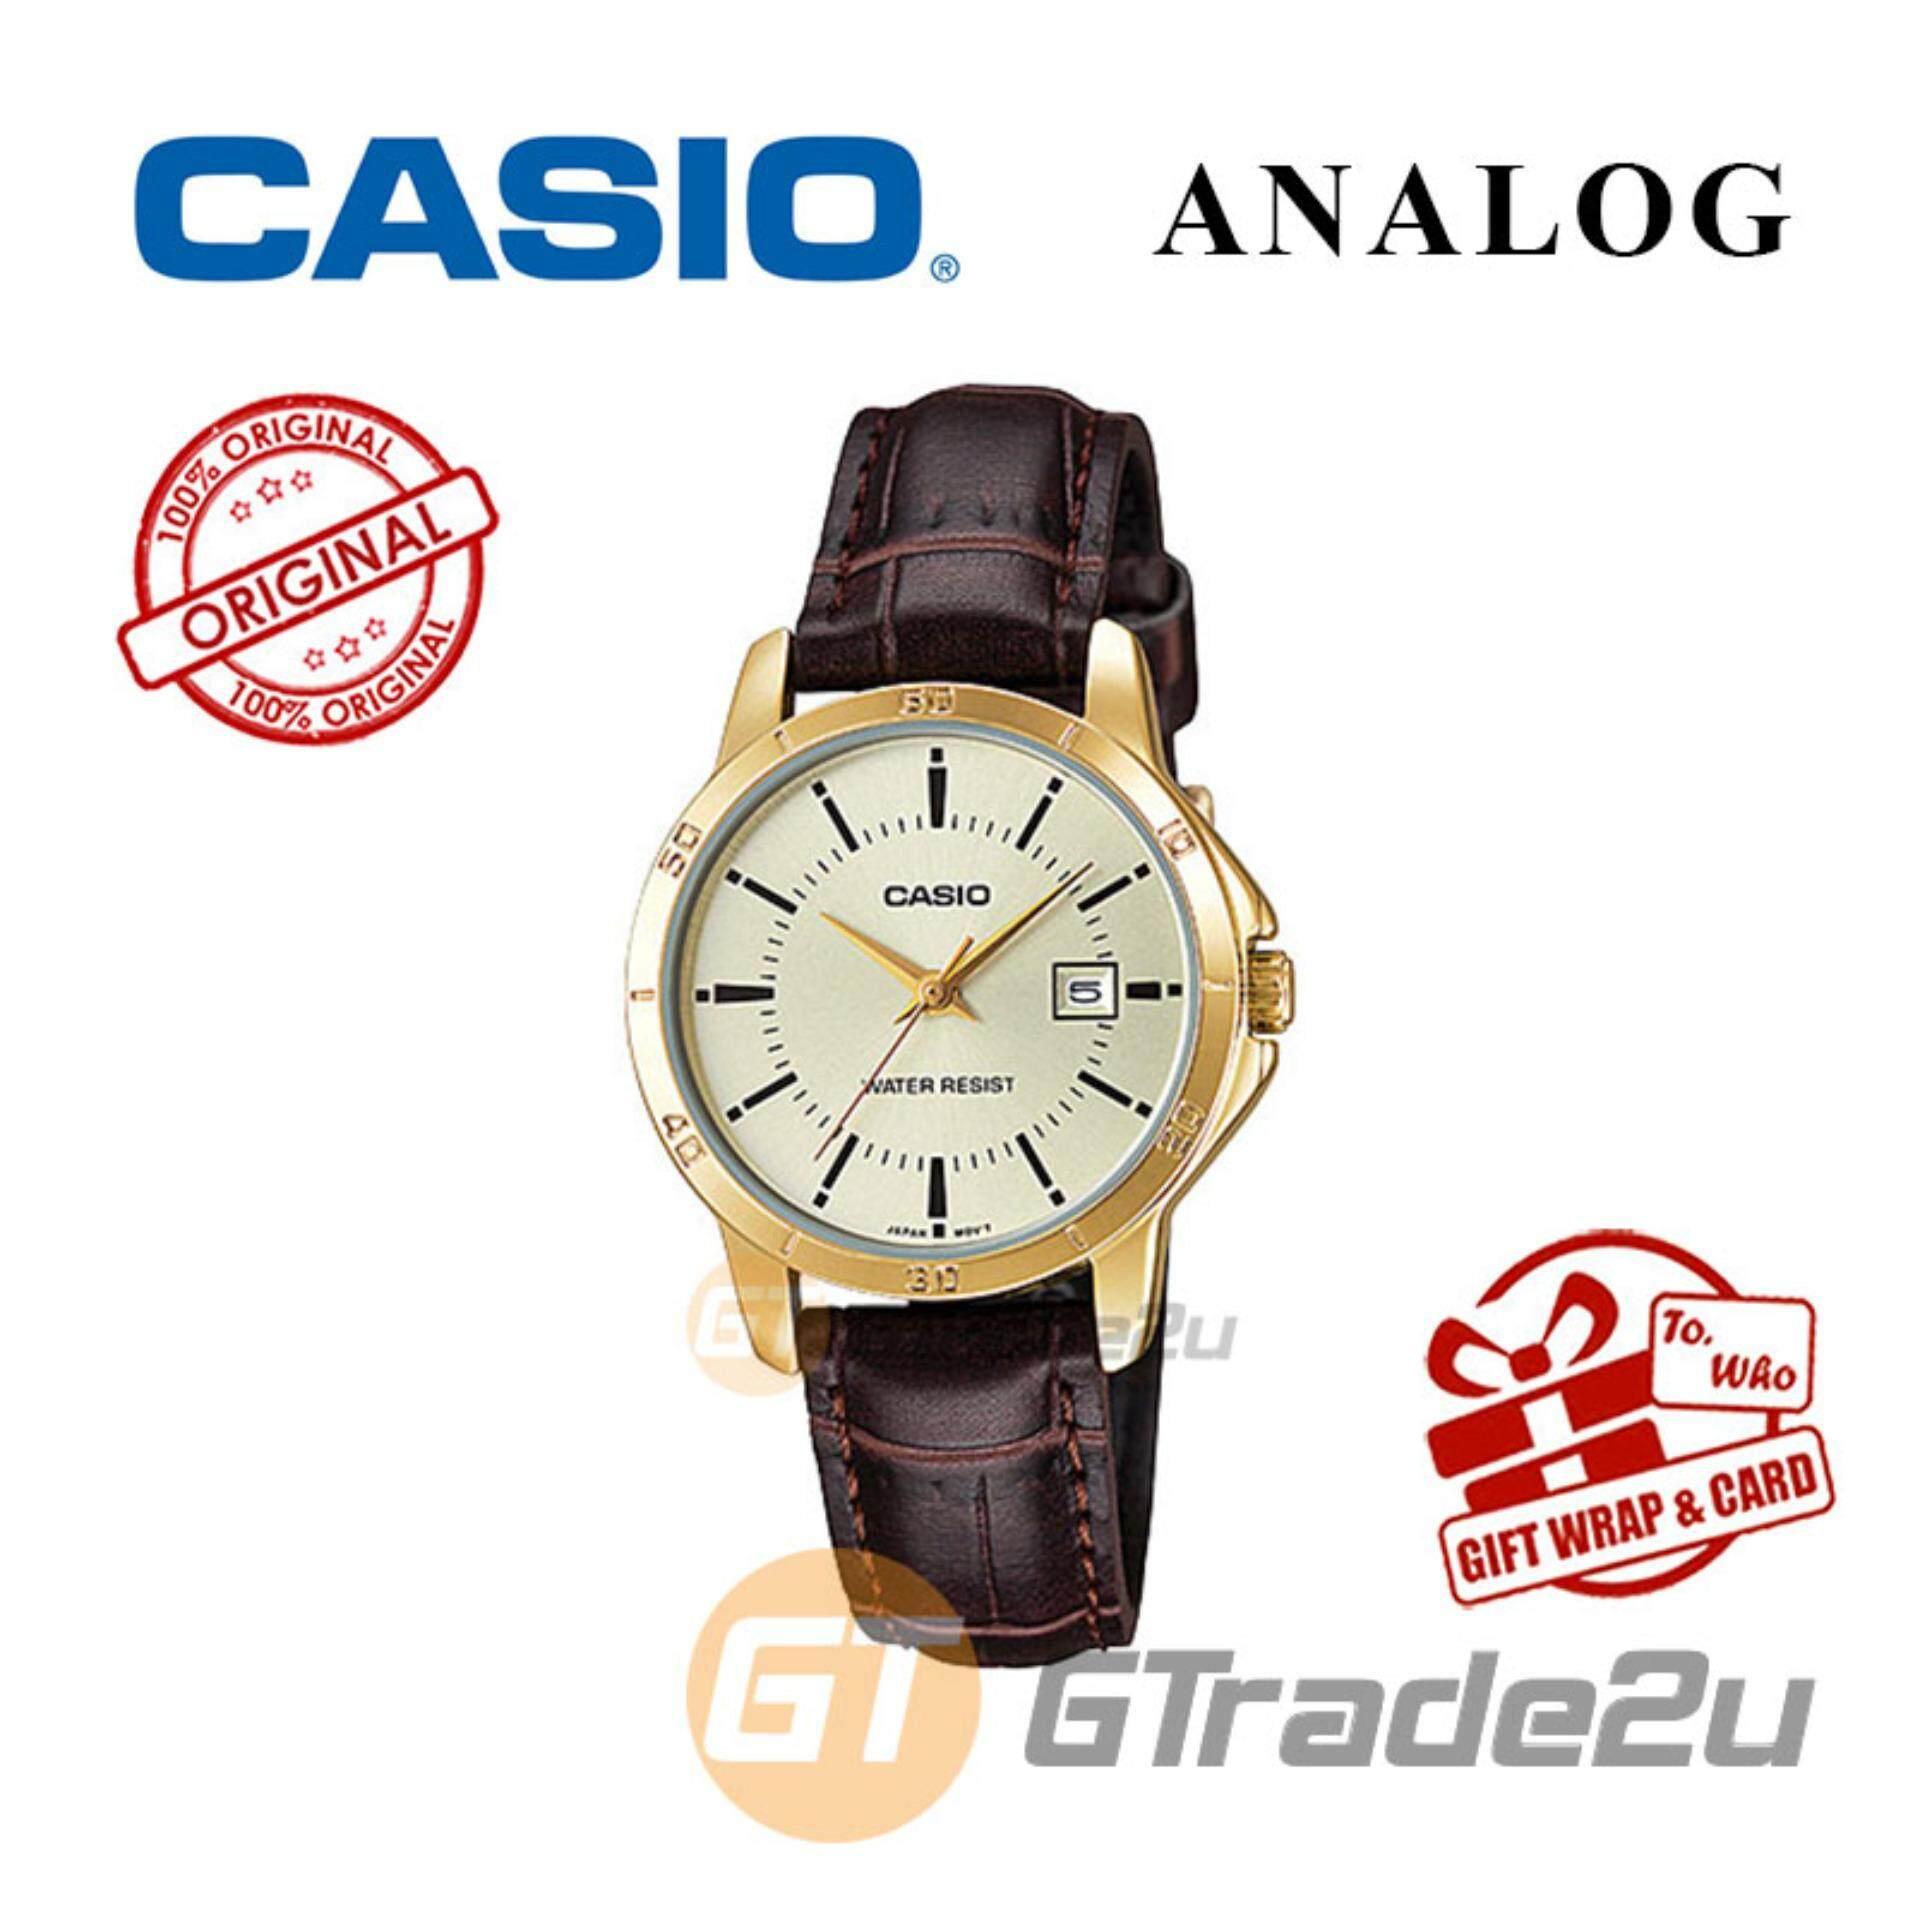 Casio Watches With Best Price At Lazada Malaysia Jam Tangan Ae 1000w 1b Original Standard Ltp V004gl 9av Analog Ladies Watch Gold Leather